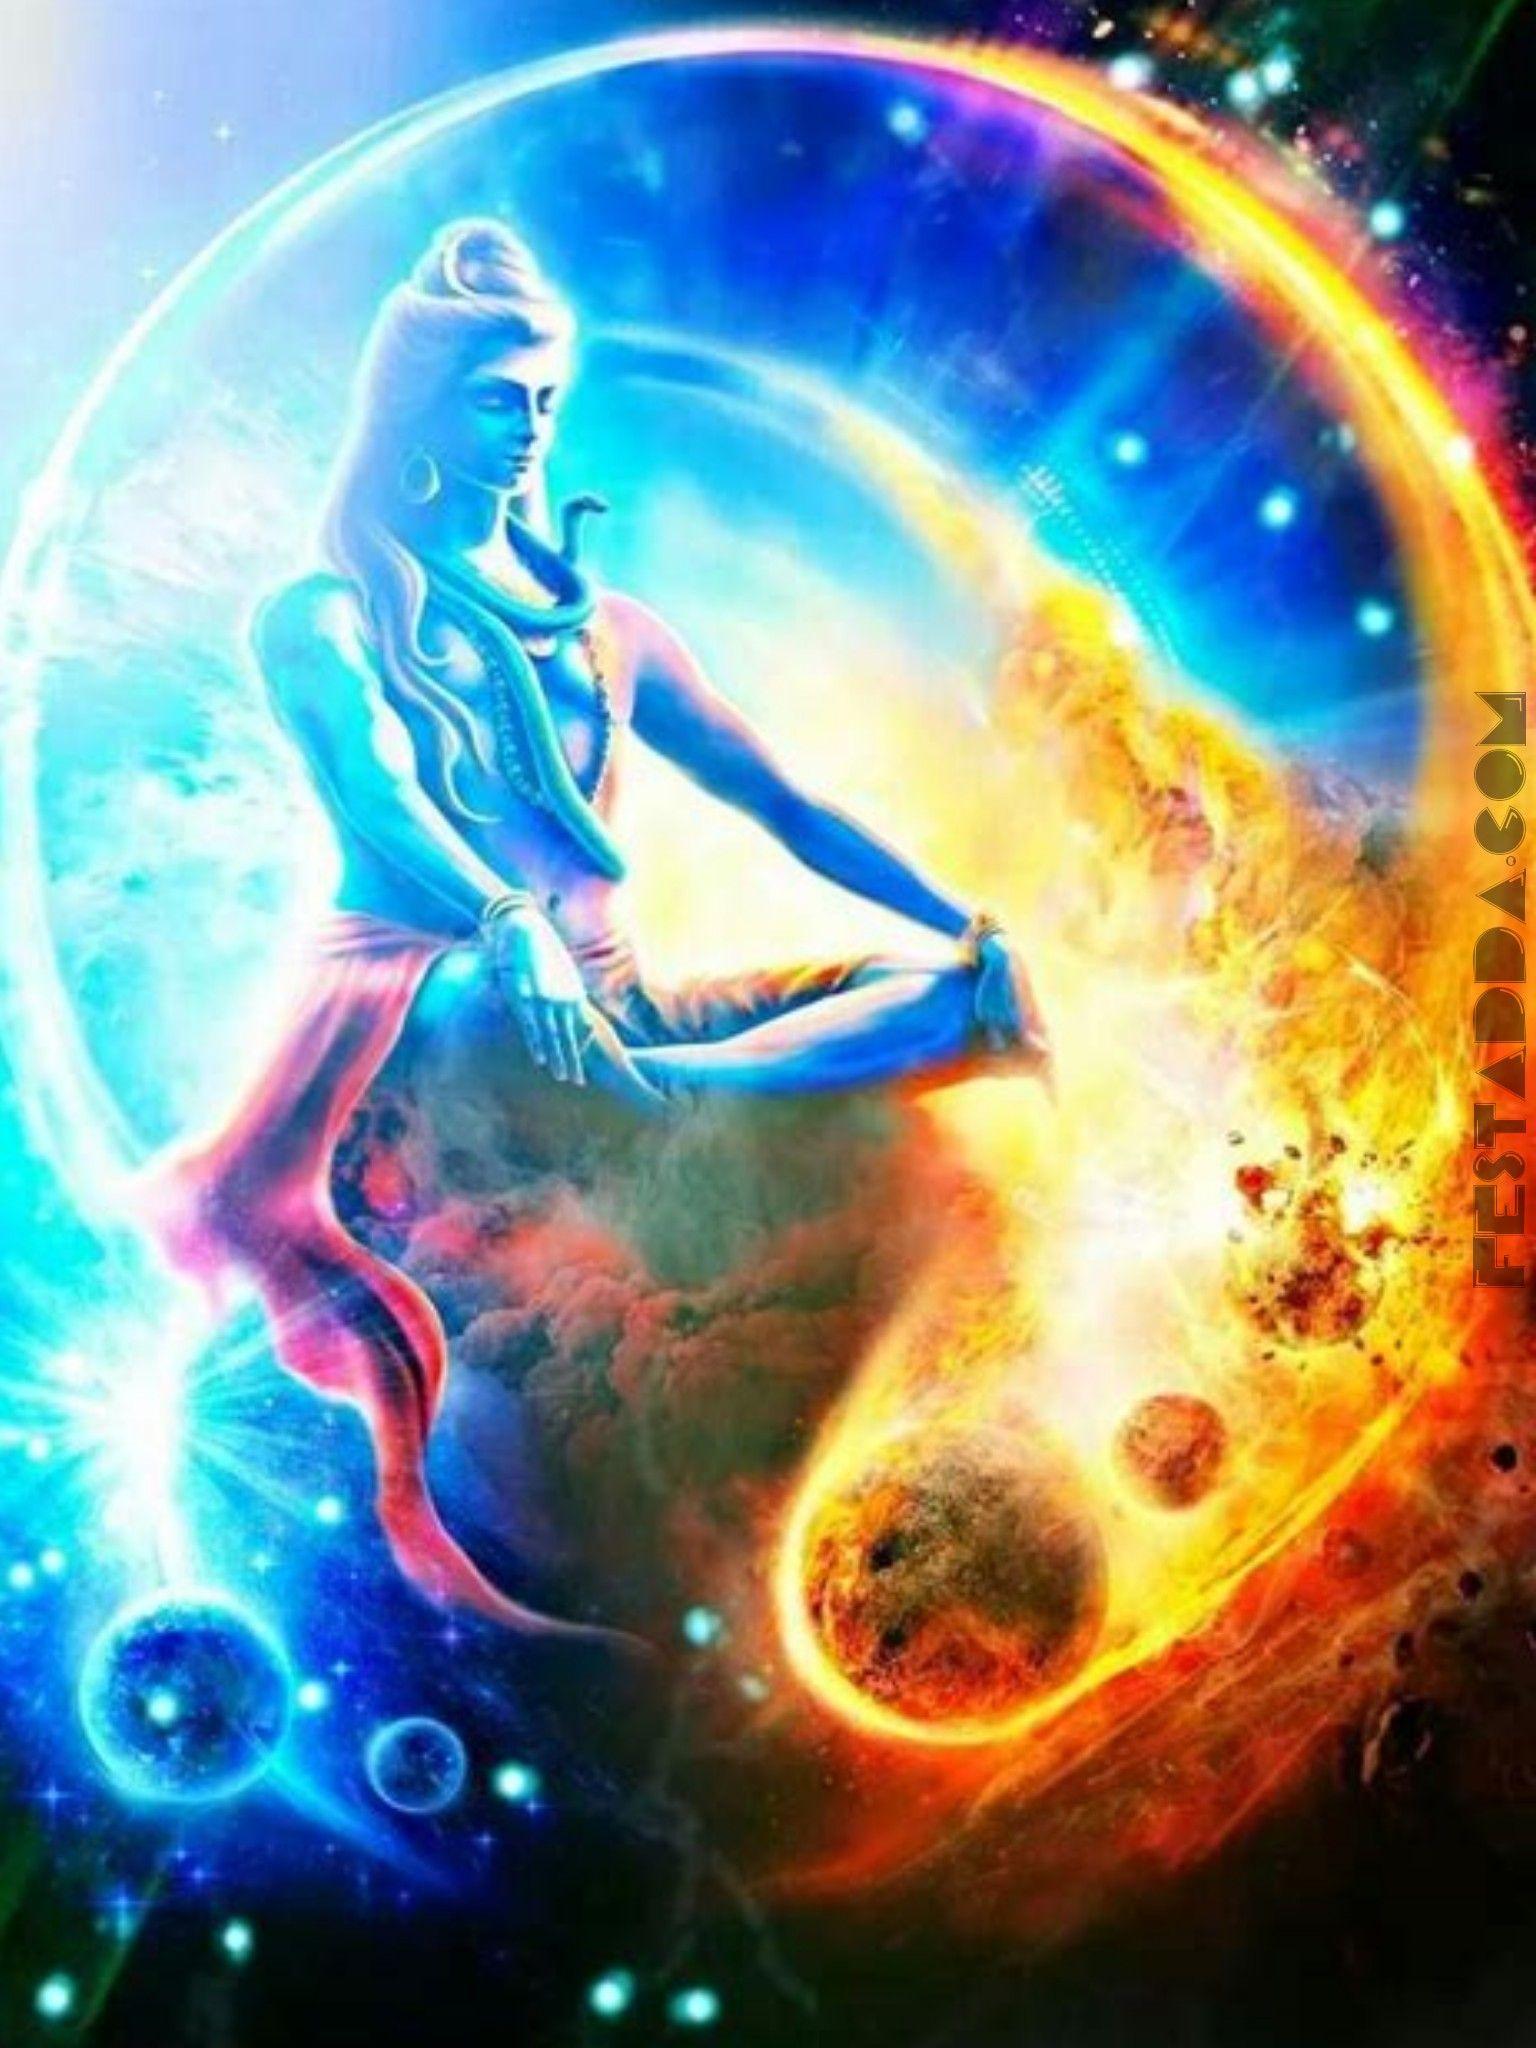 Lord Shiva Images For Whatsapp Profile Shiva Images Hd Lord Shiva Shiva